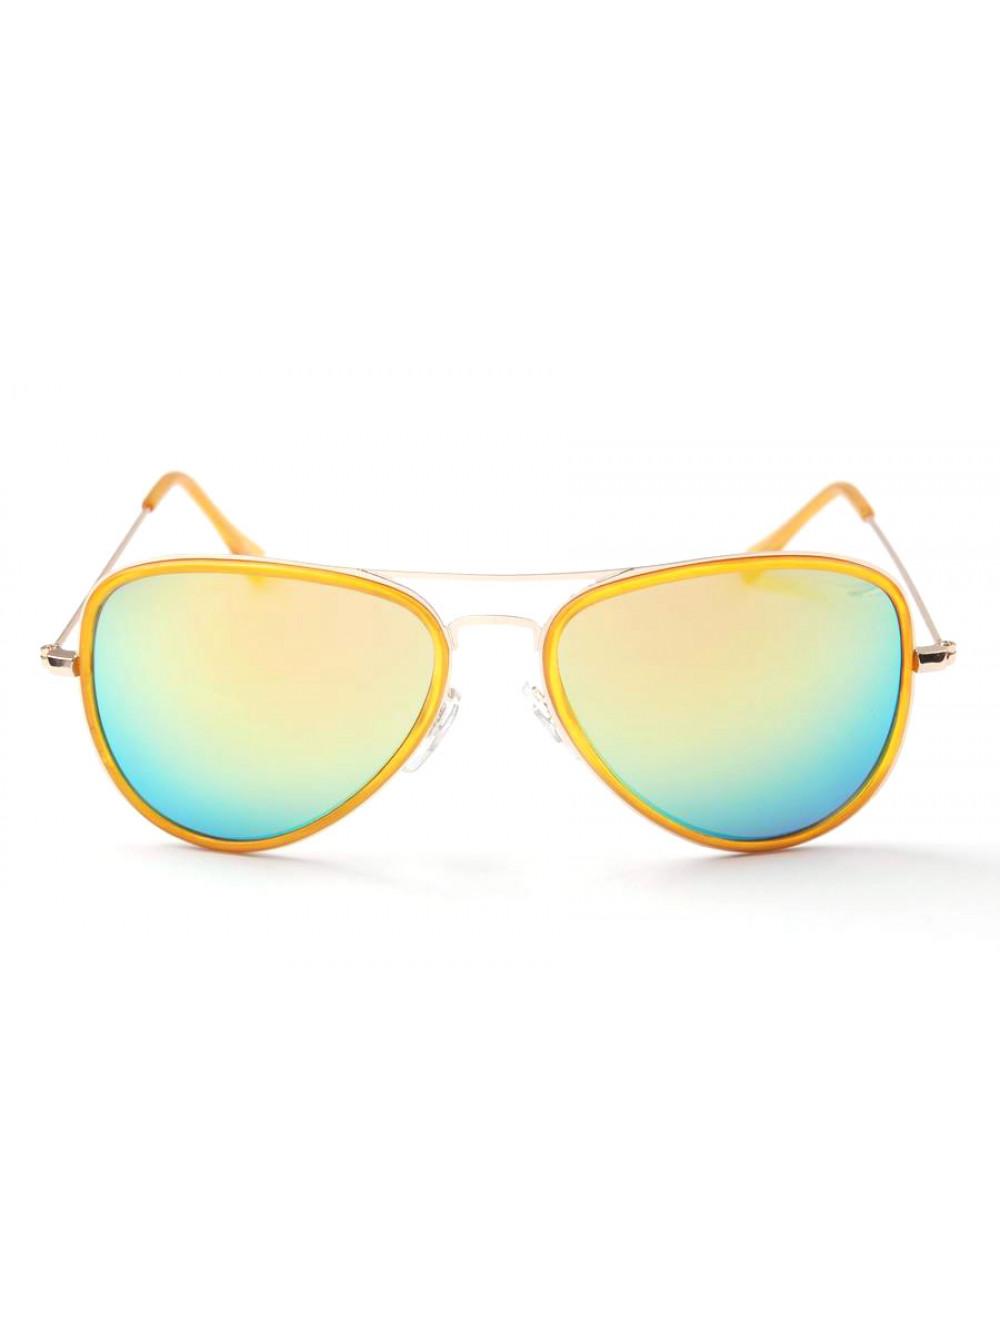 0cd26449a Slnečné okuliare Aviator Pilot XS Yellow